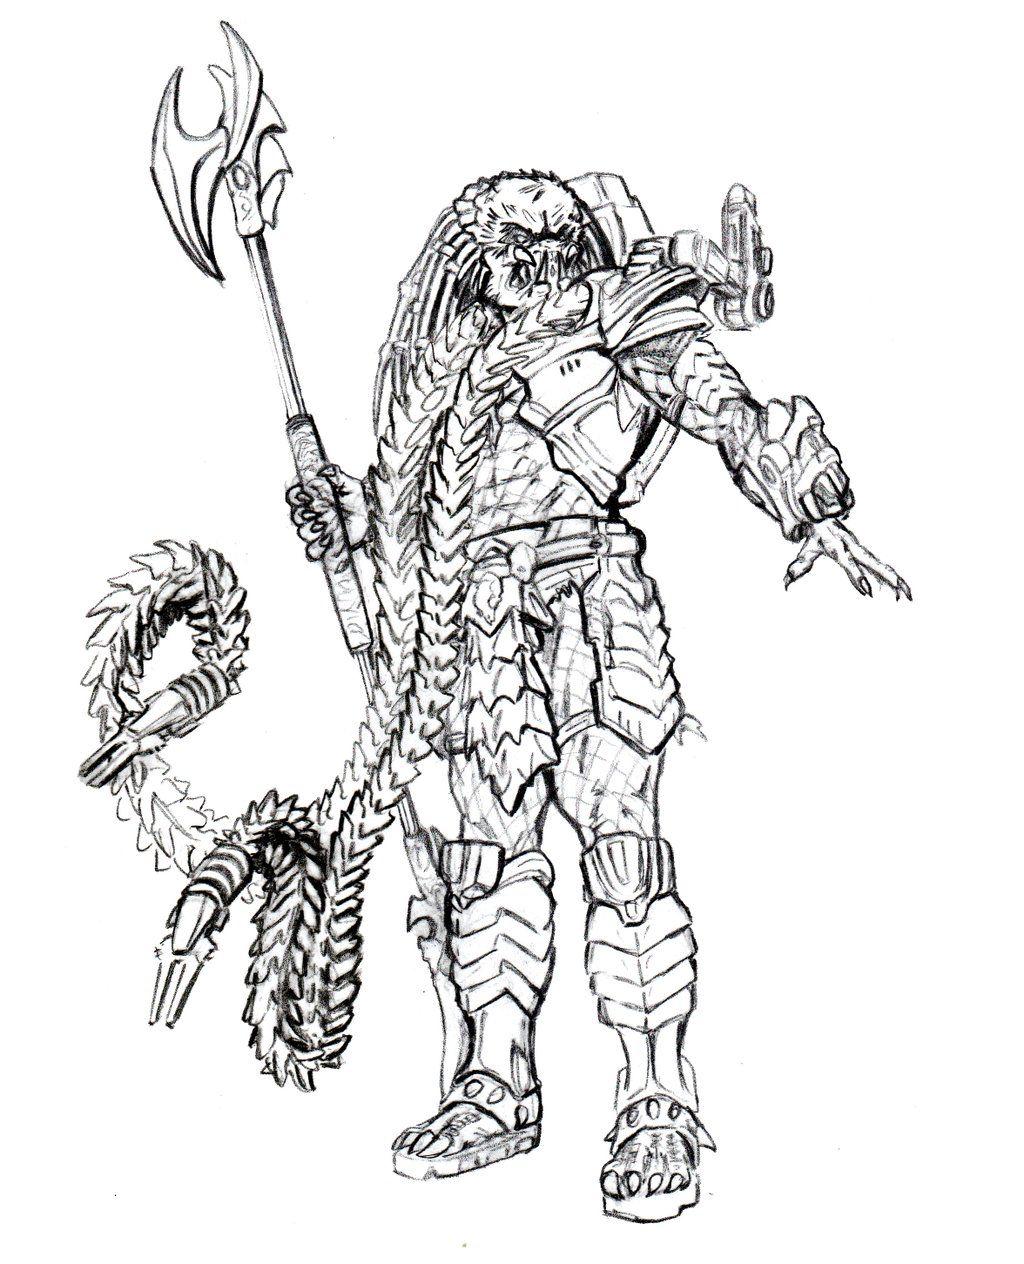 Neca Predator Series 16 Page 2 Predator Art Predator Alien Predator Movie